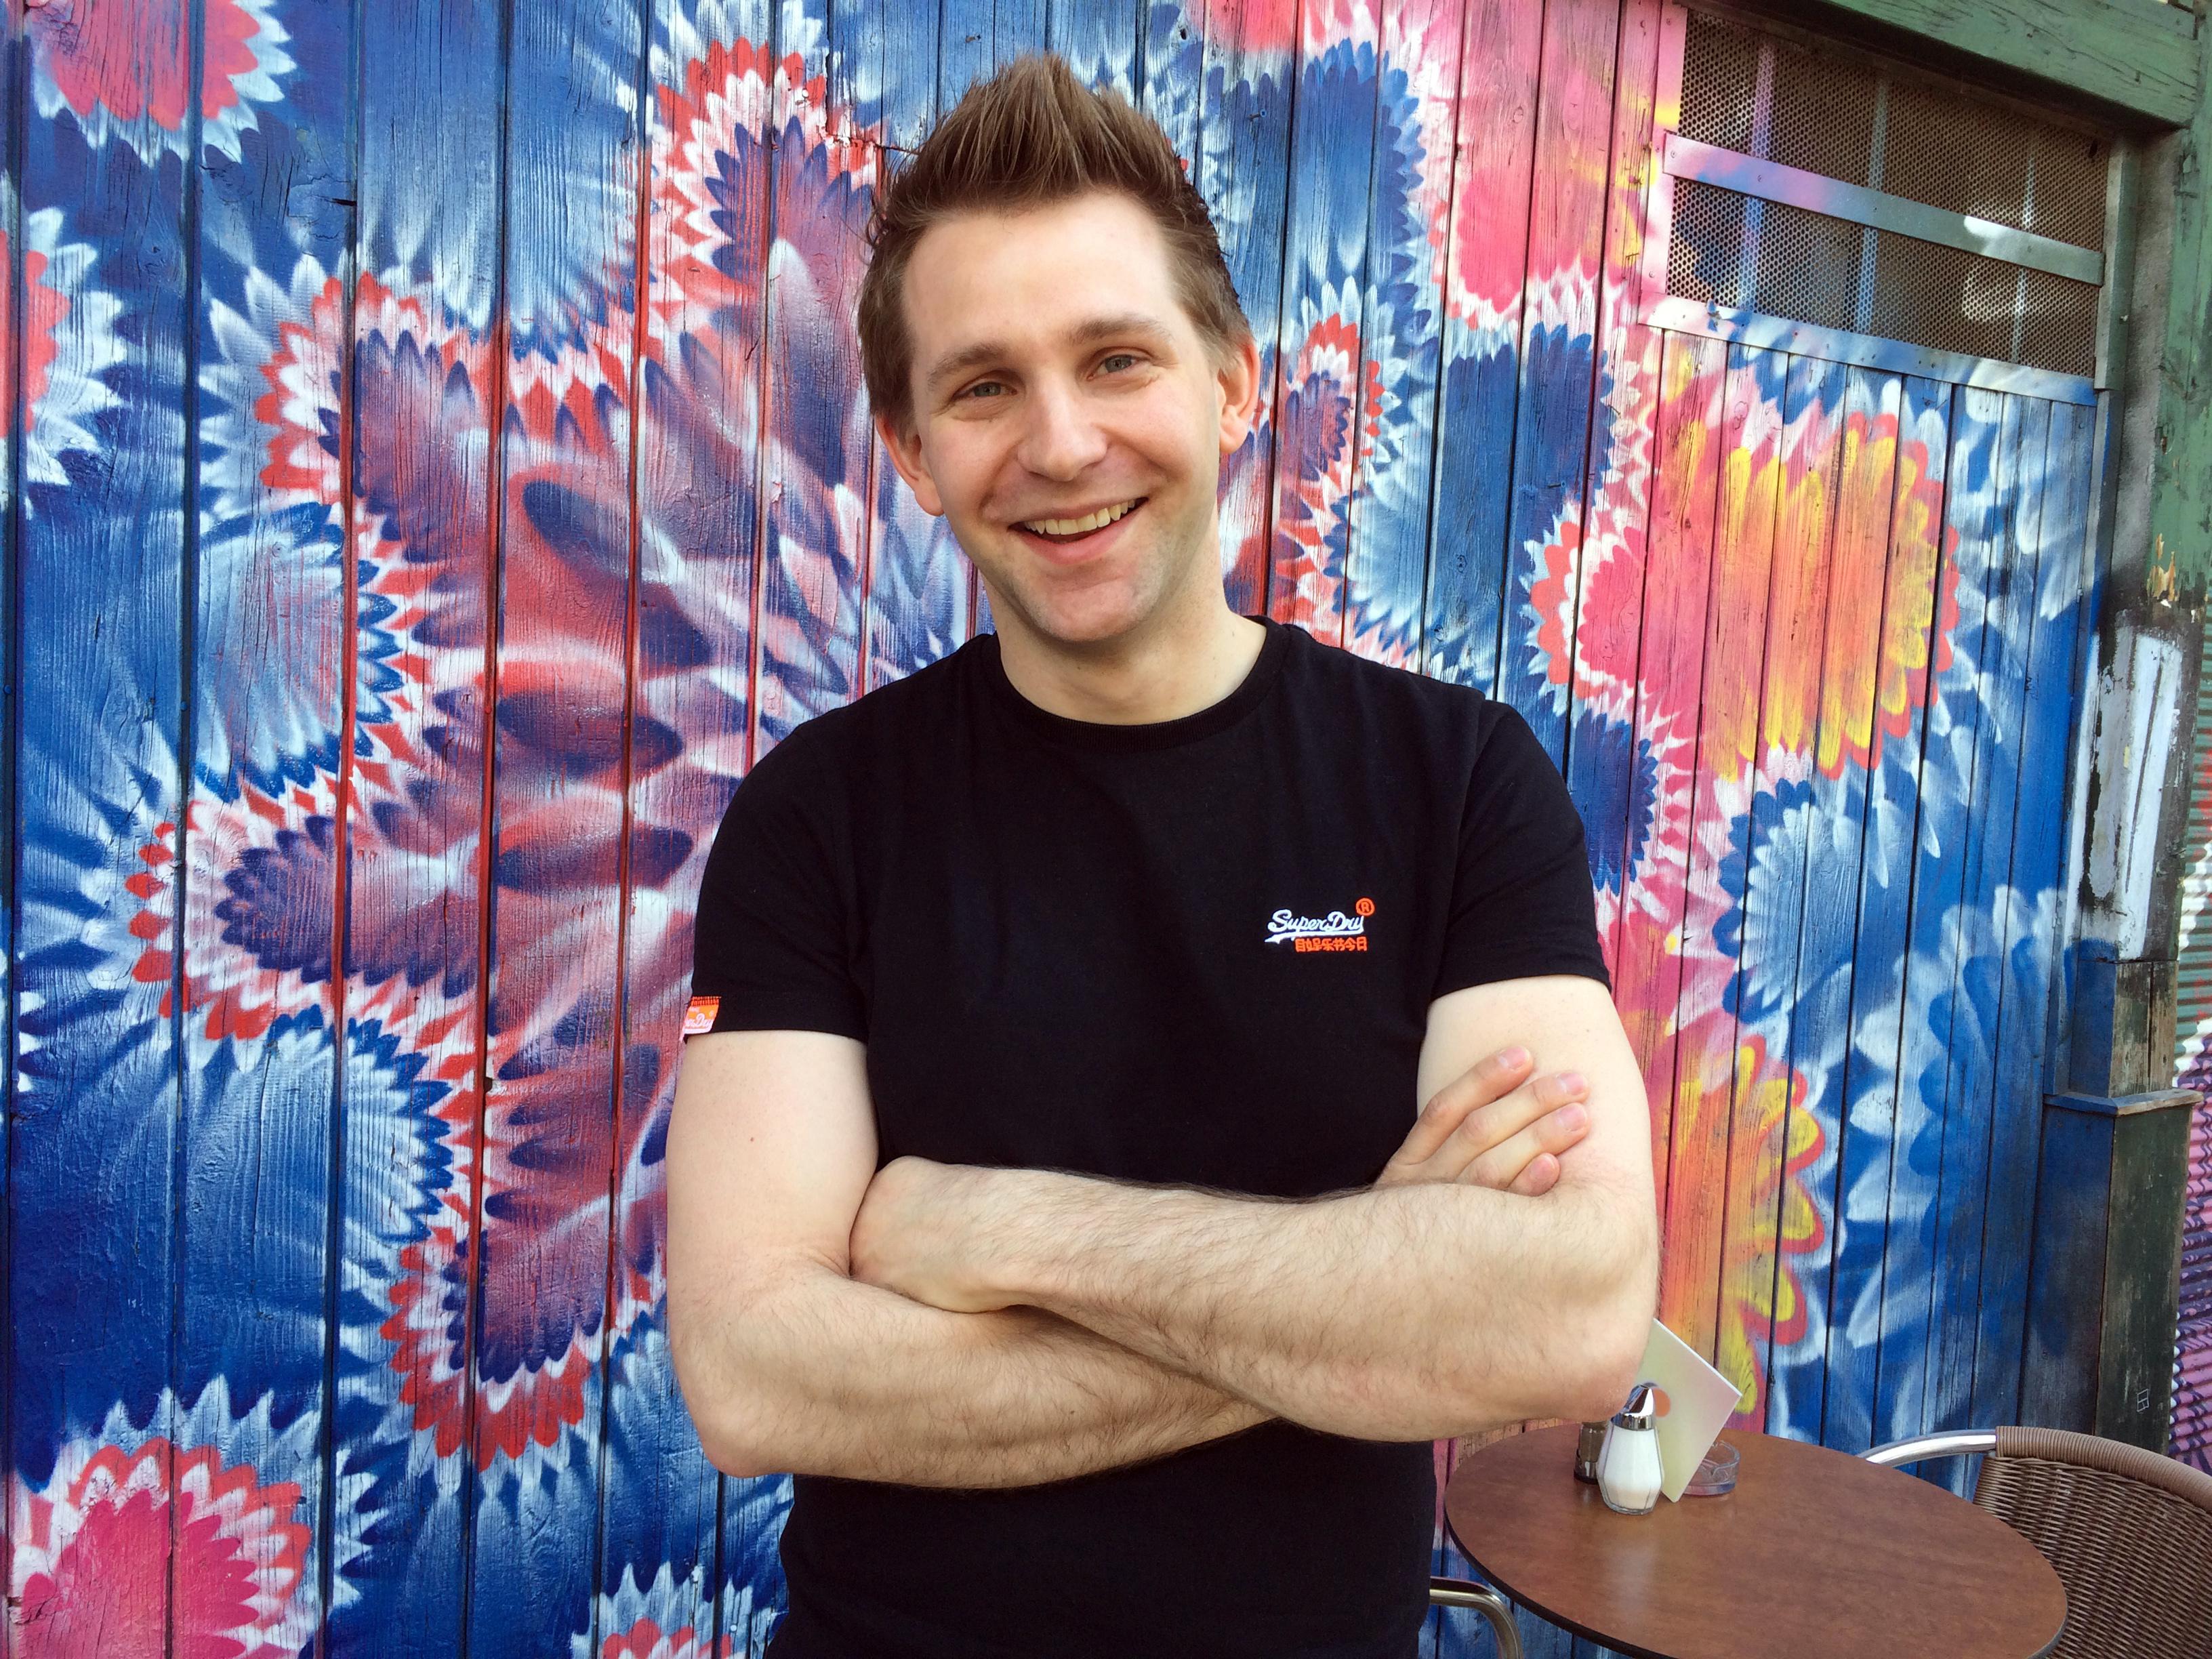 Privacy campaigner Max Schrems